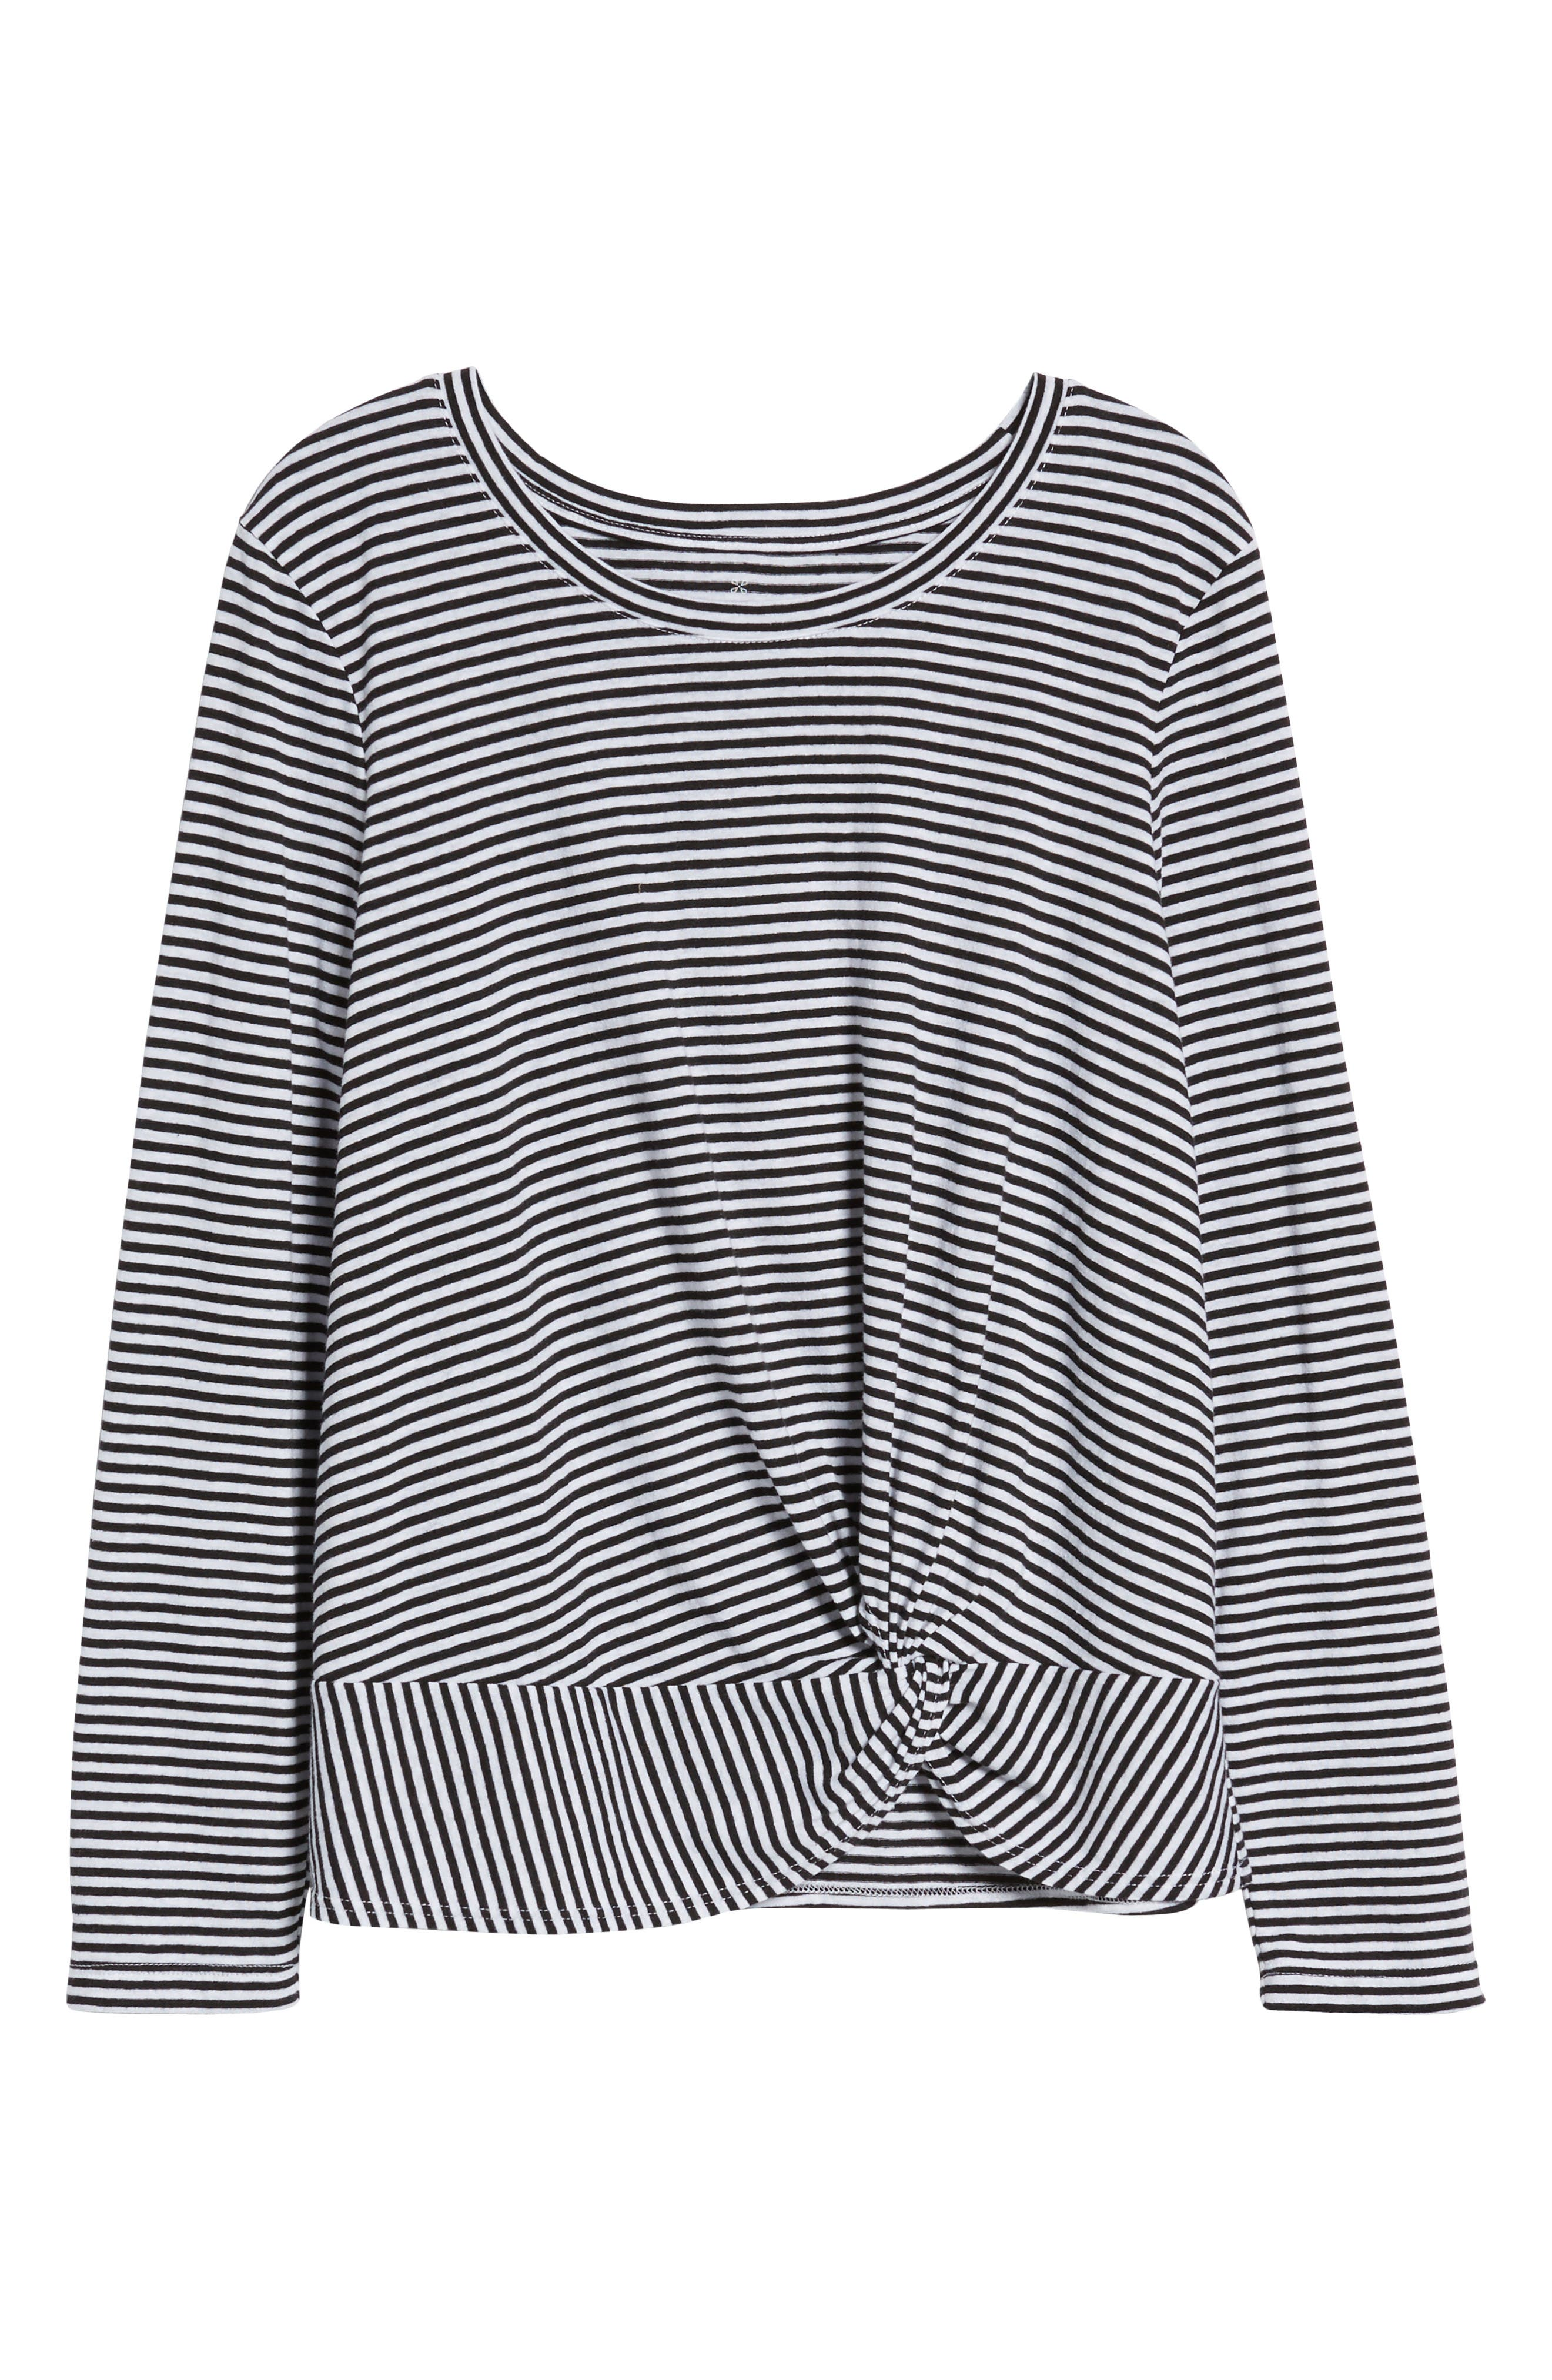 Long Sleeve Front Knot Tee,                             Alternate thumbnail 6, color,                             Black- White Even Stripe